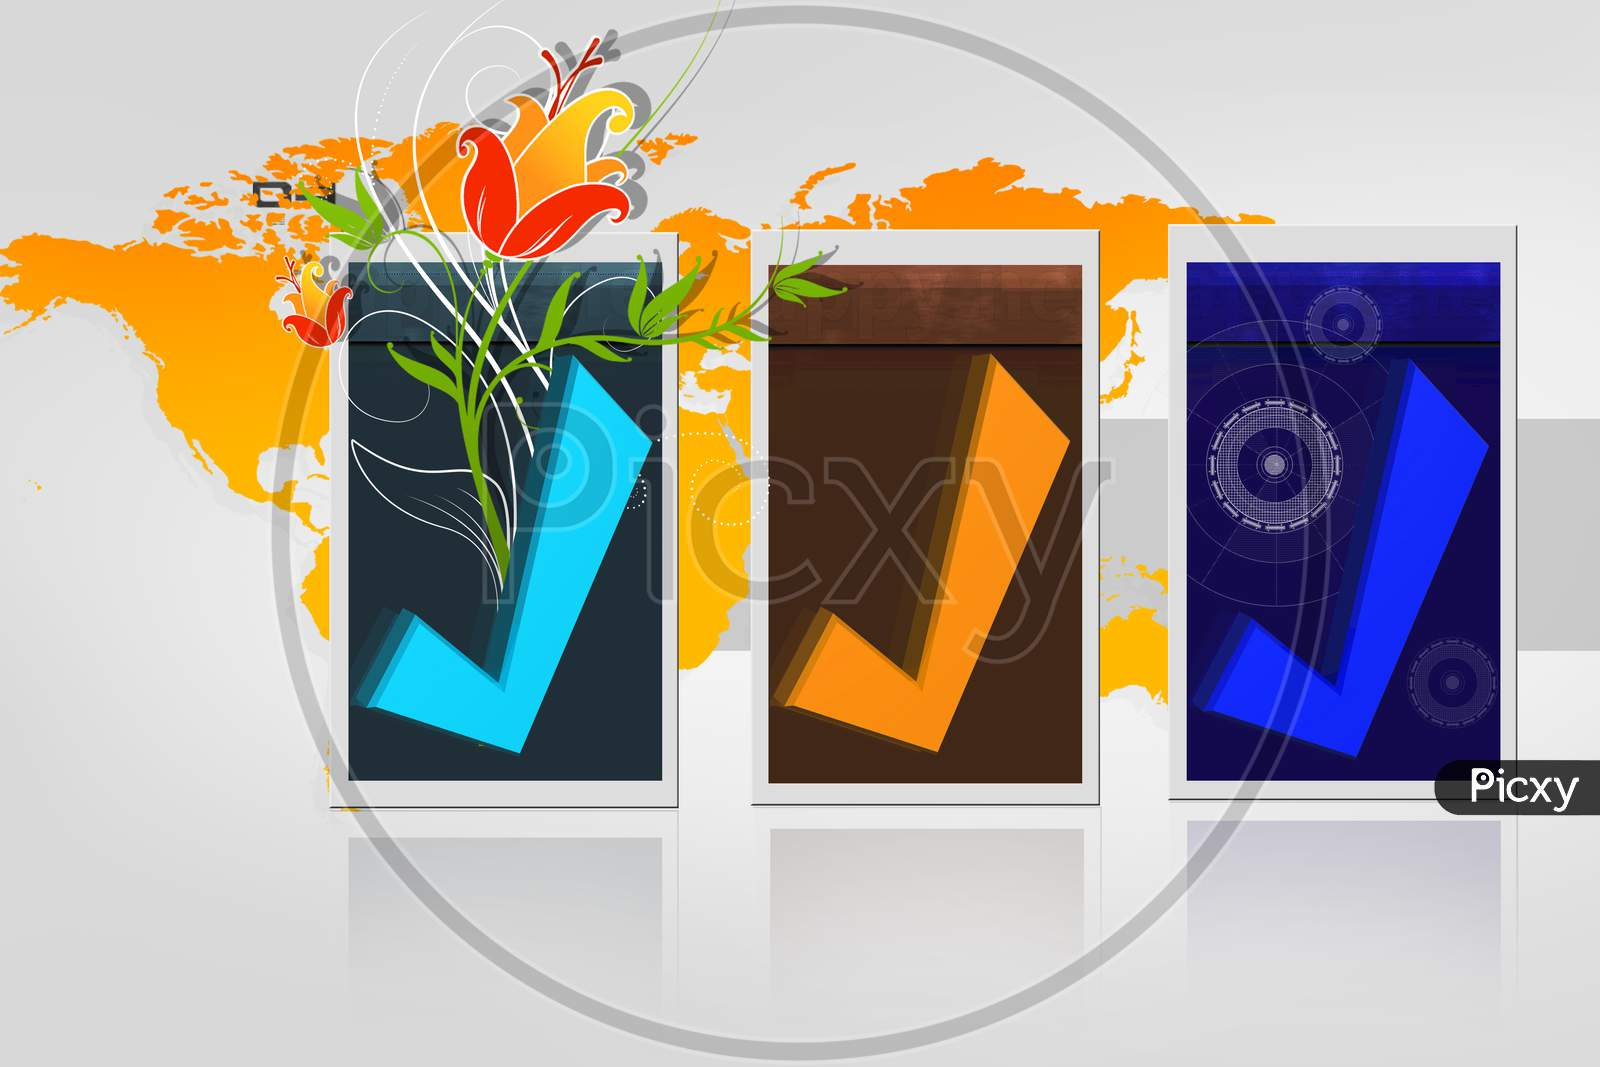 3D Rendering Right Symbol In Digital Color Background